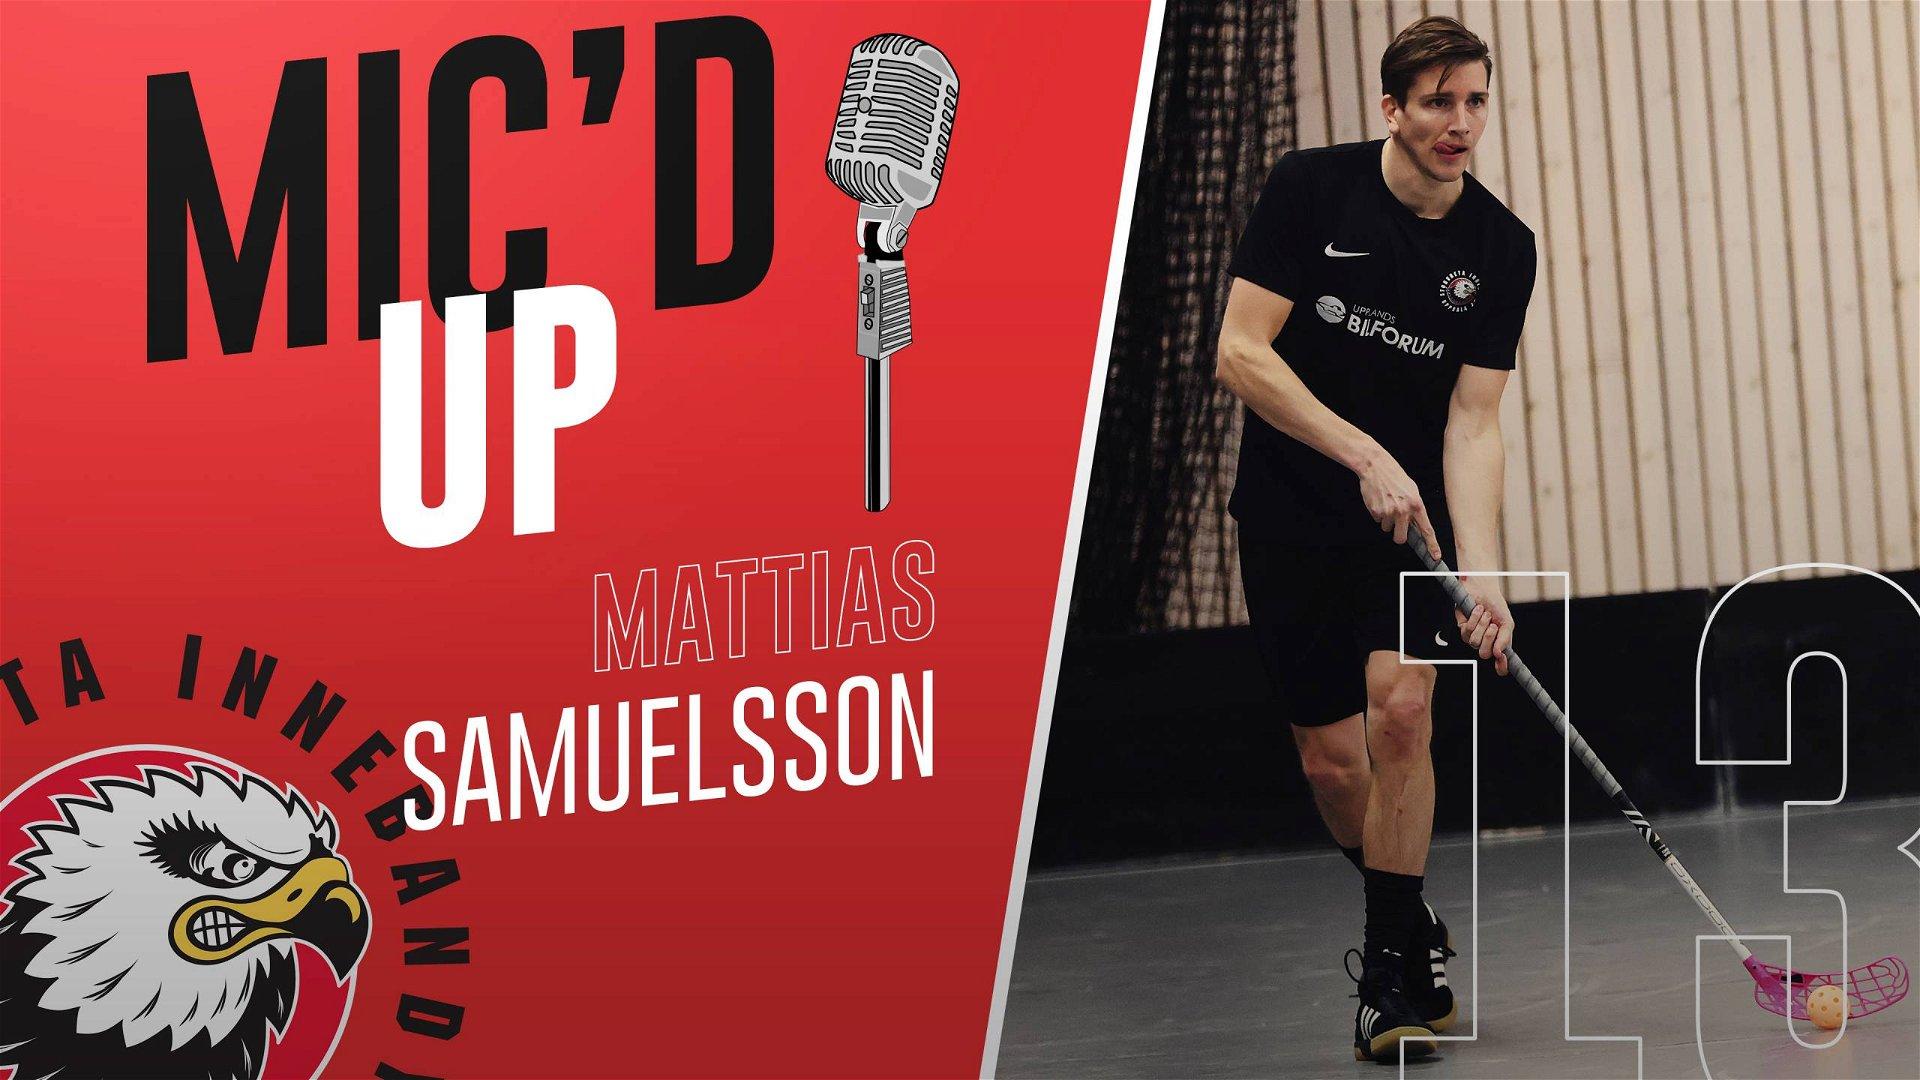 Mic'd Up – Mattias Samuelsson